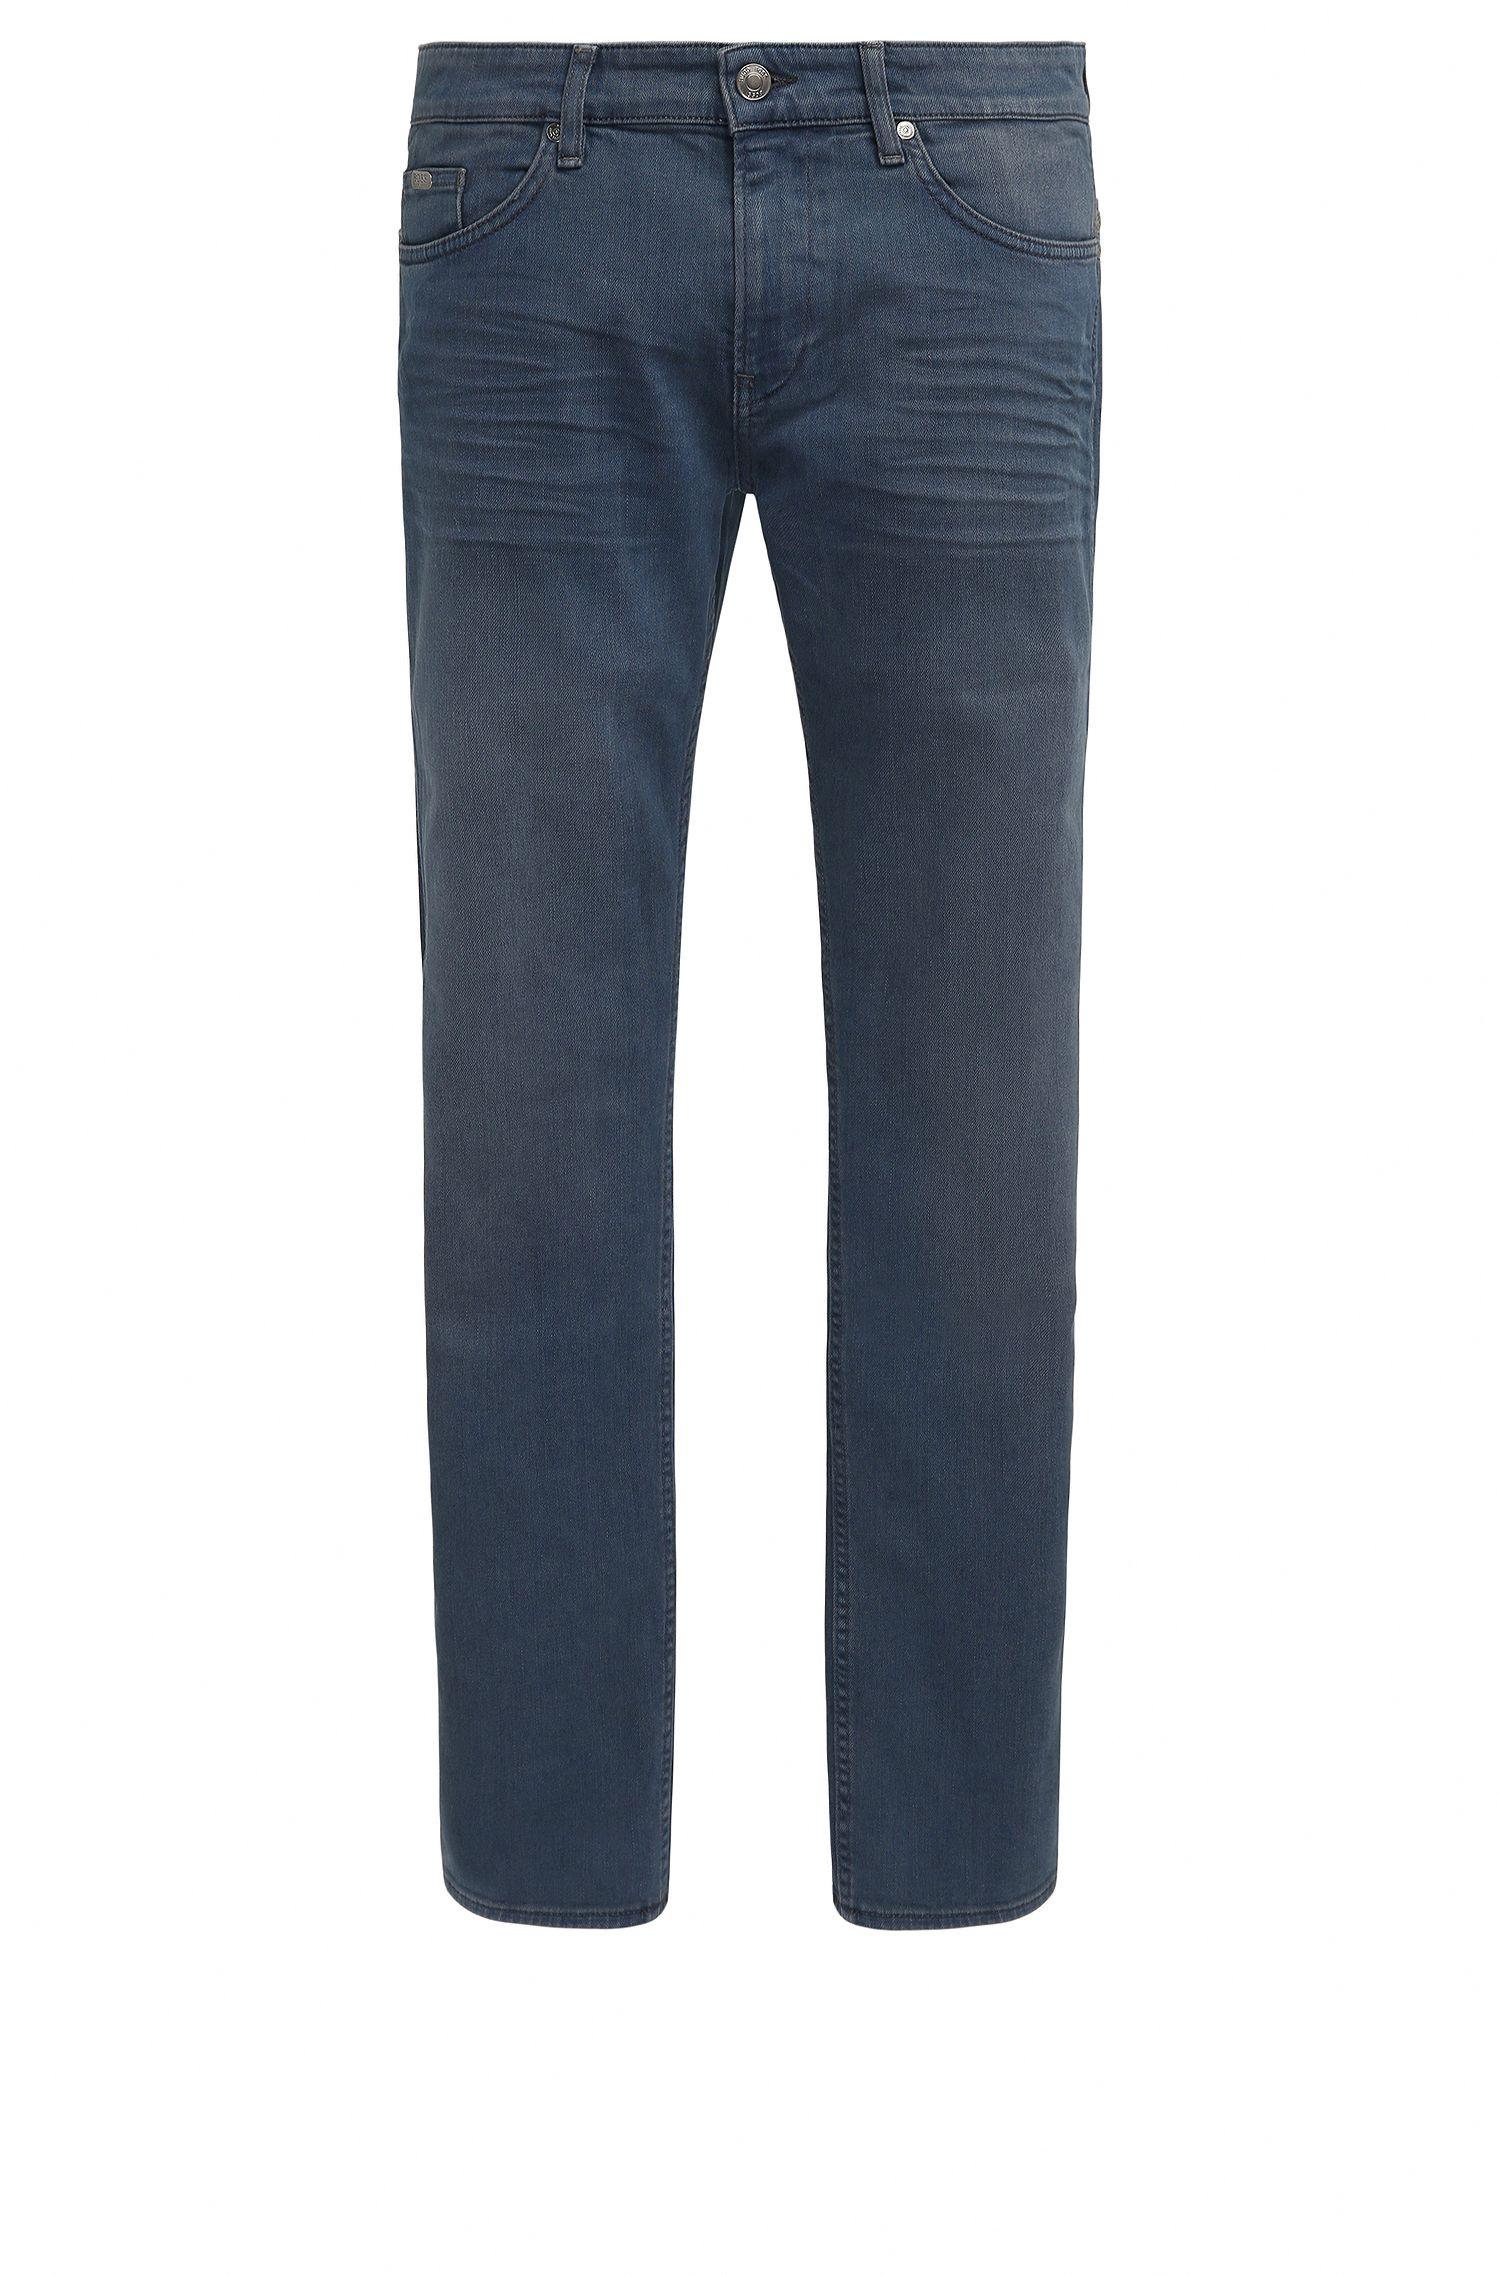 Slim-Fit Jeans aus überfärbtem Denim